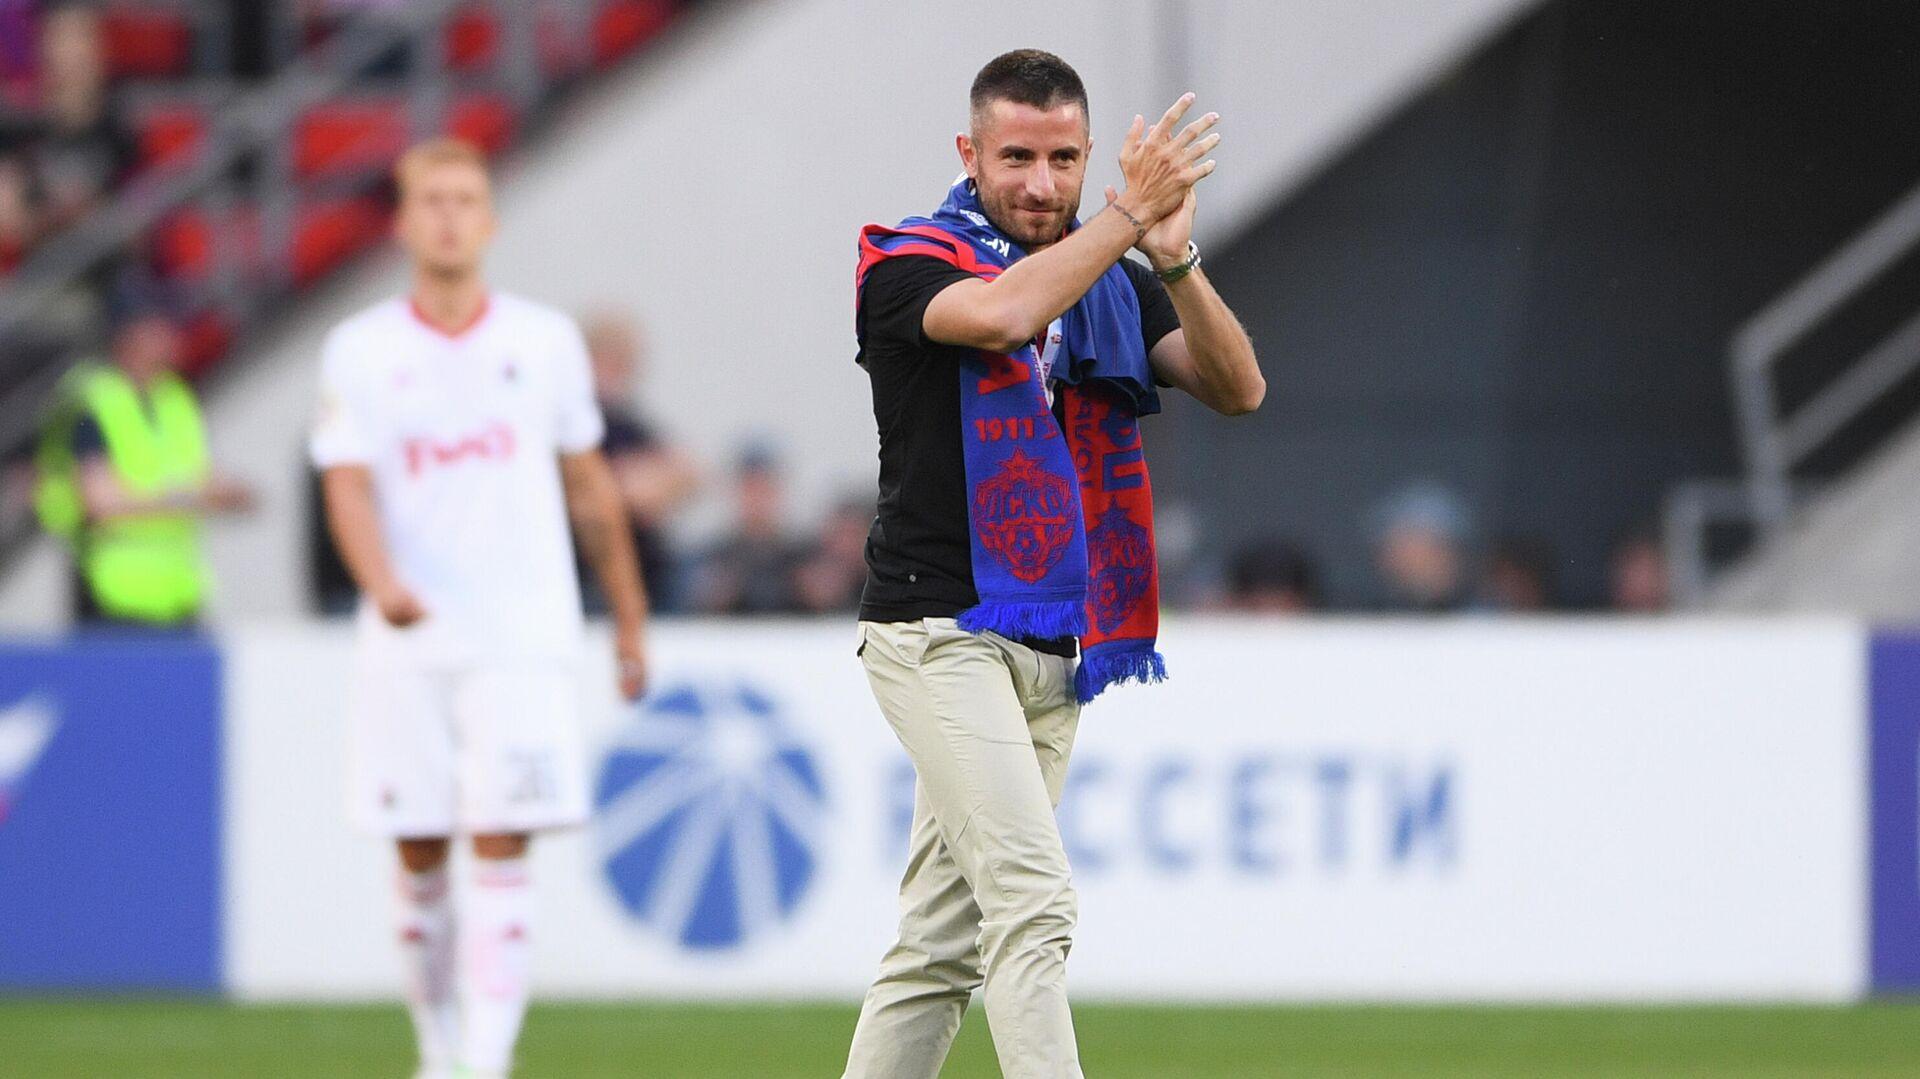 Футболист Зоран Тошич - РИА Новости, 1920, 18.06.2021